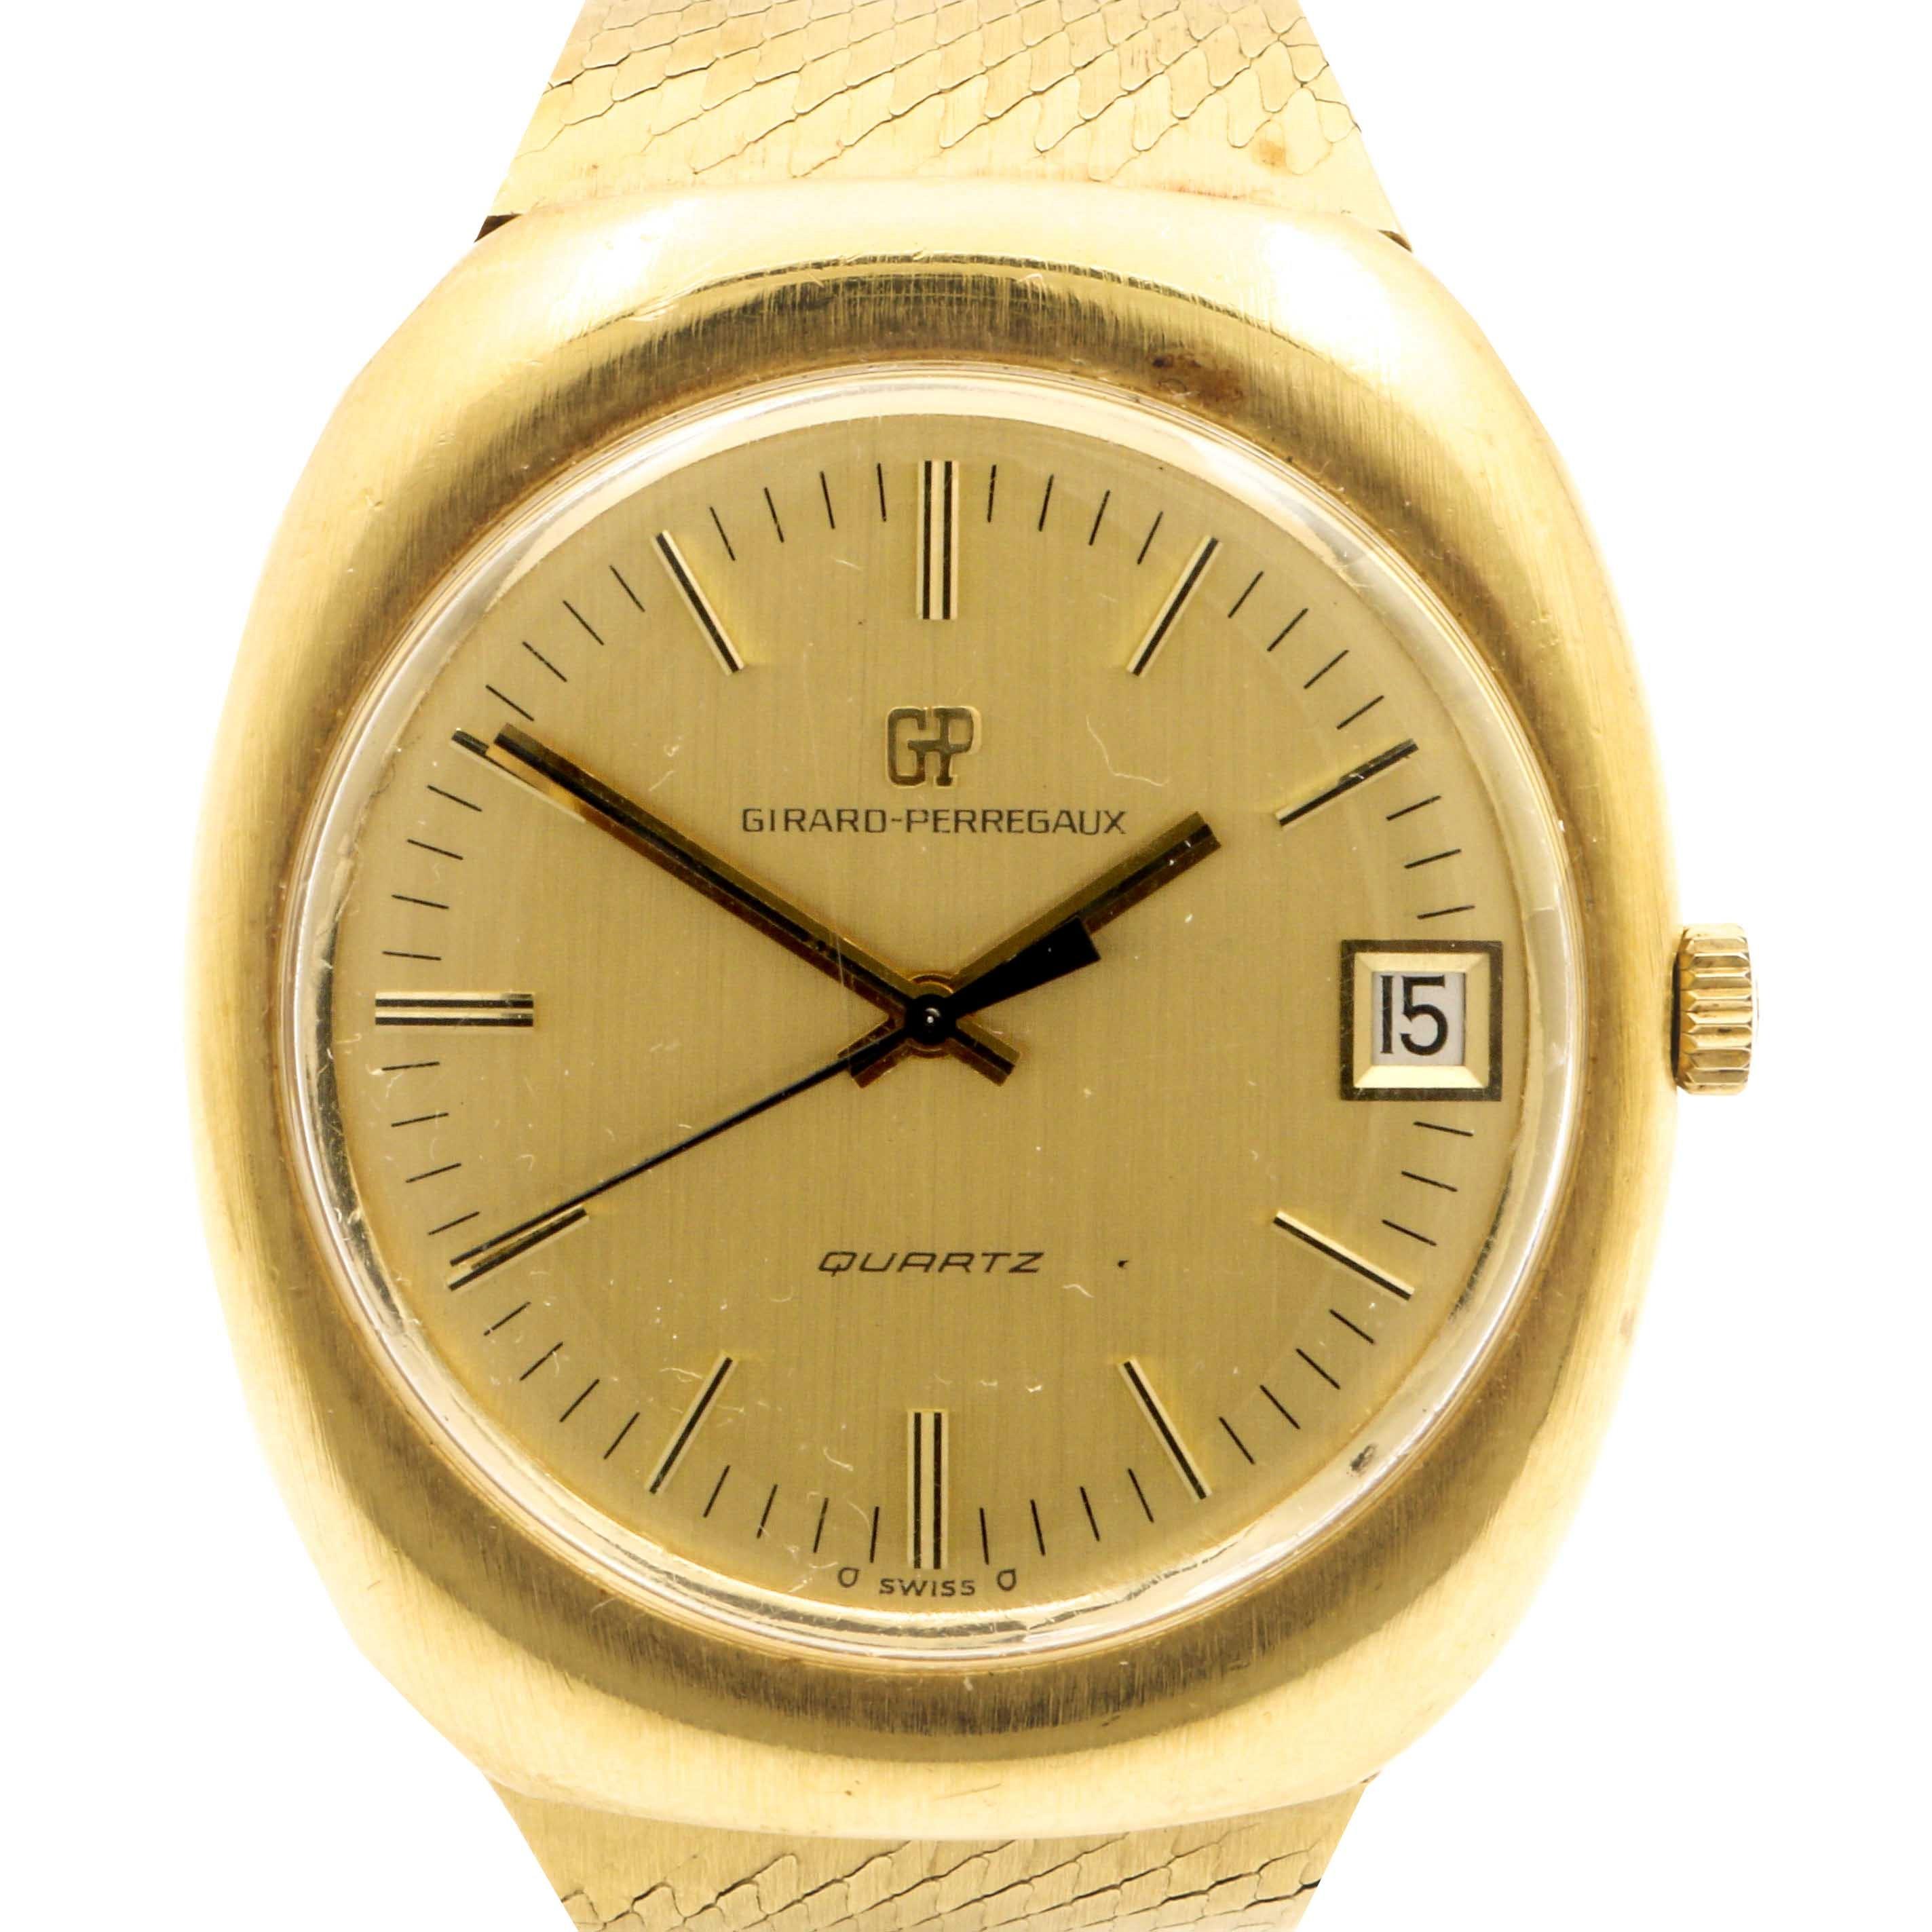 18K Yellow Gold Girard-Perregaux Wristwatch